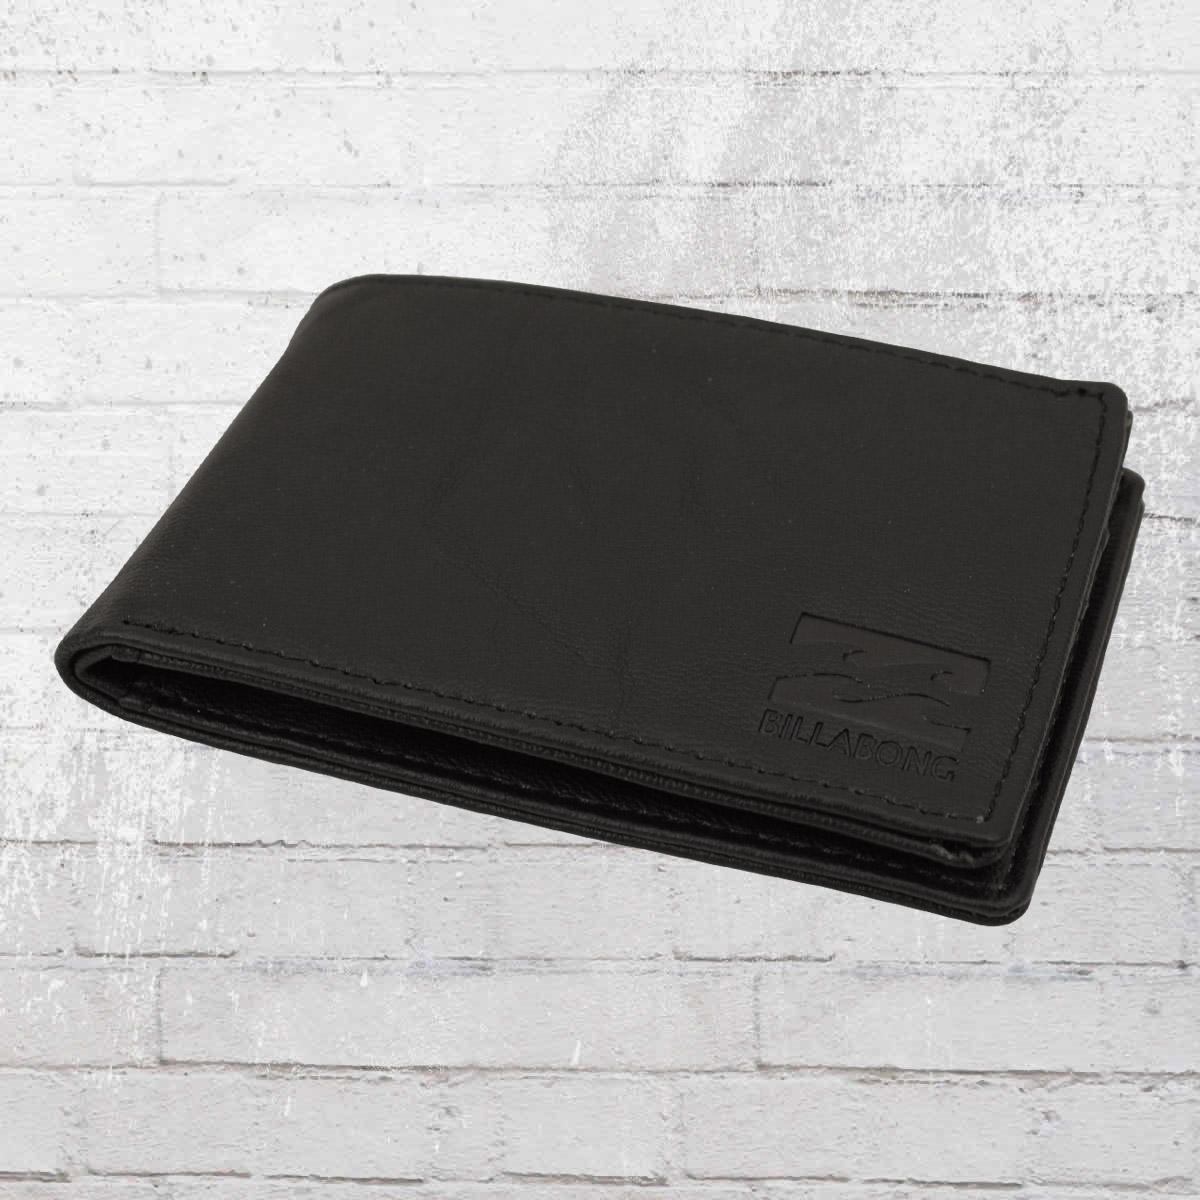 6d6c52cb4fd03 Billabong Kleines Portmonnaie Revival Flip Wallet schwarz. ›‹